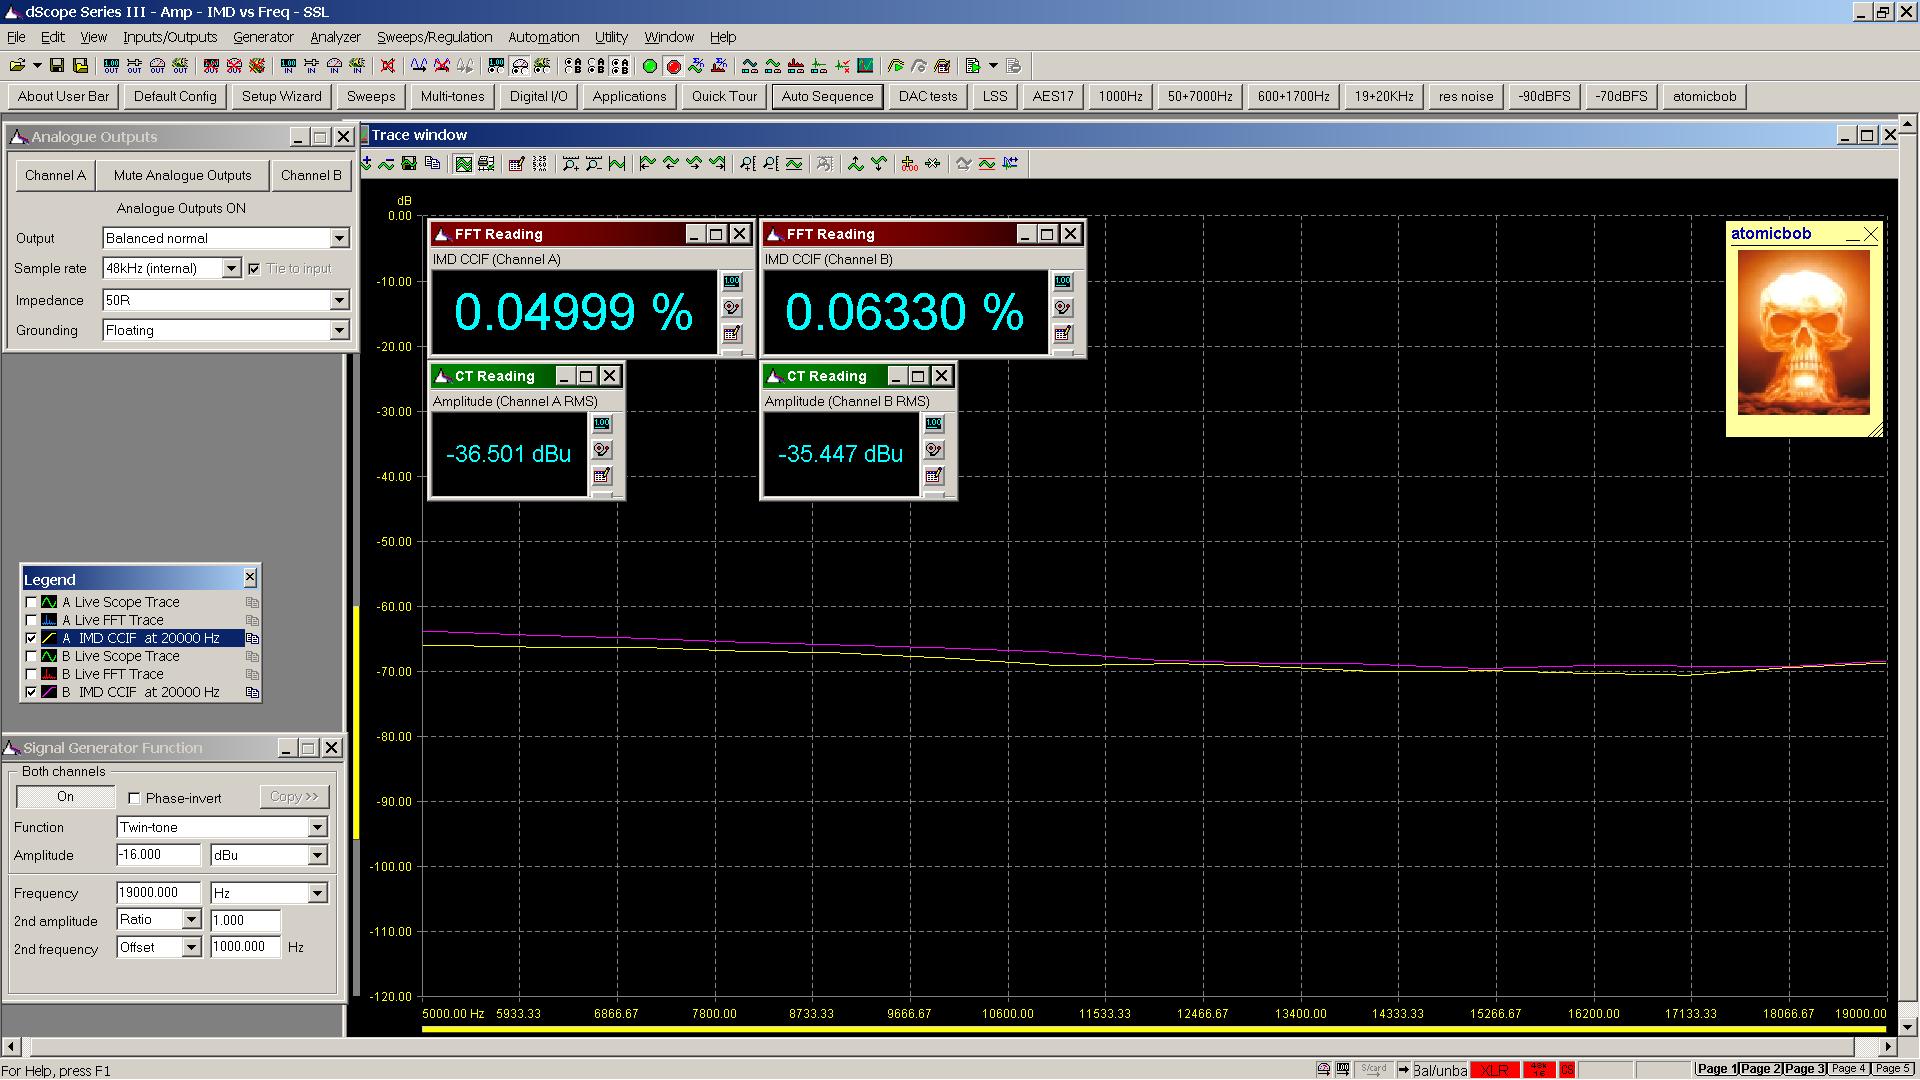 20191007 SW51+ 6Z51P 19+20KHz IMD sweep 20KHz to 5KHz 30R LoZ -20dB gain.png